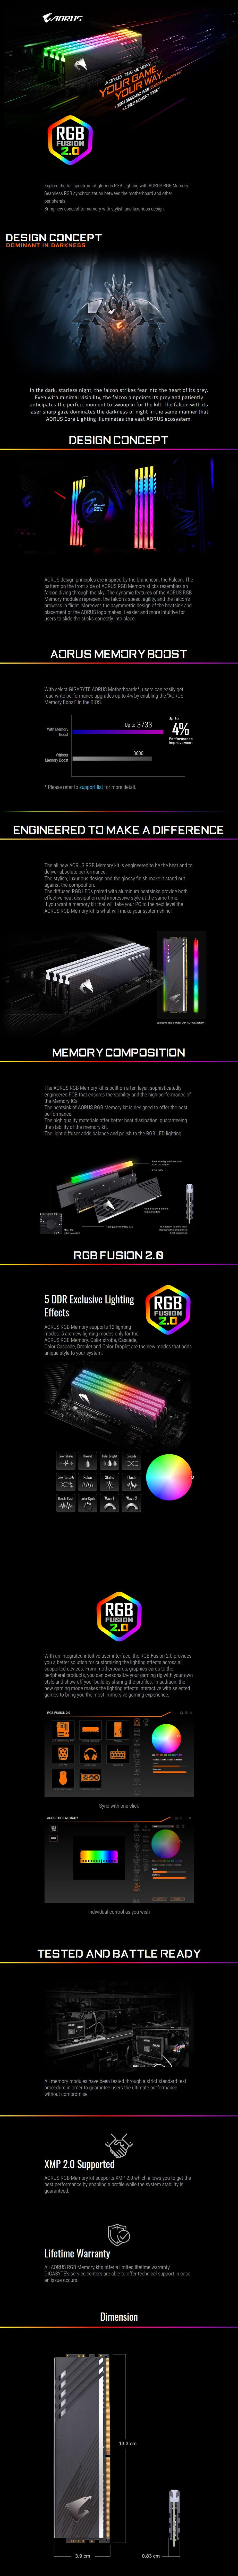 Gigabyte AORUS RGB 16GB (2x 8GB) DDR4 3600MHz Memory - Gray - Overview 1